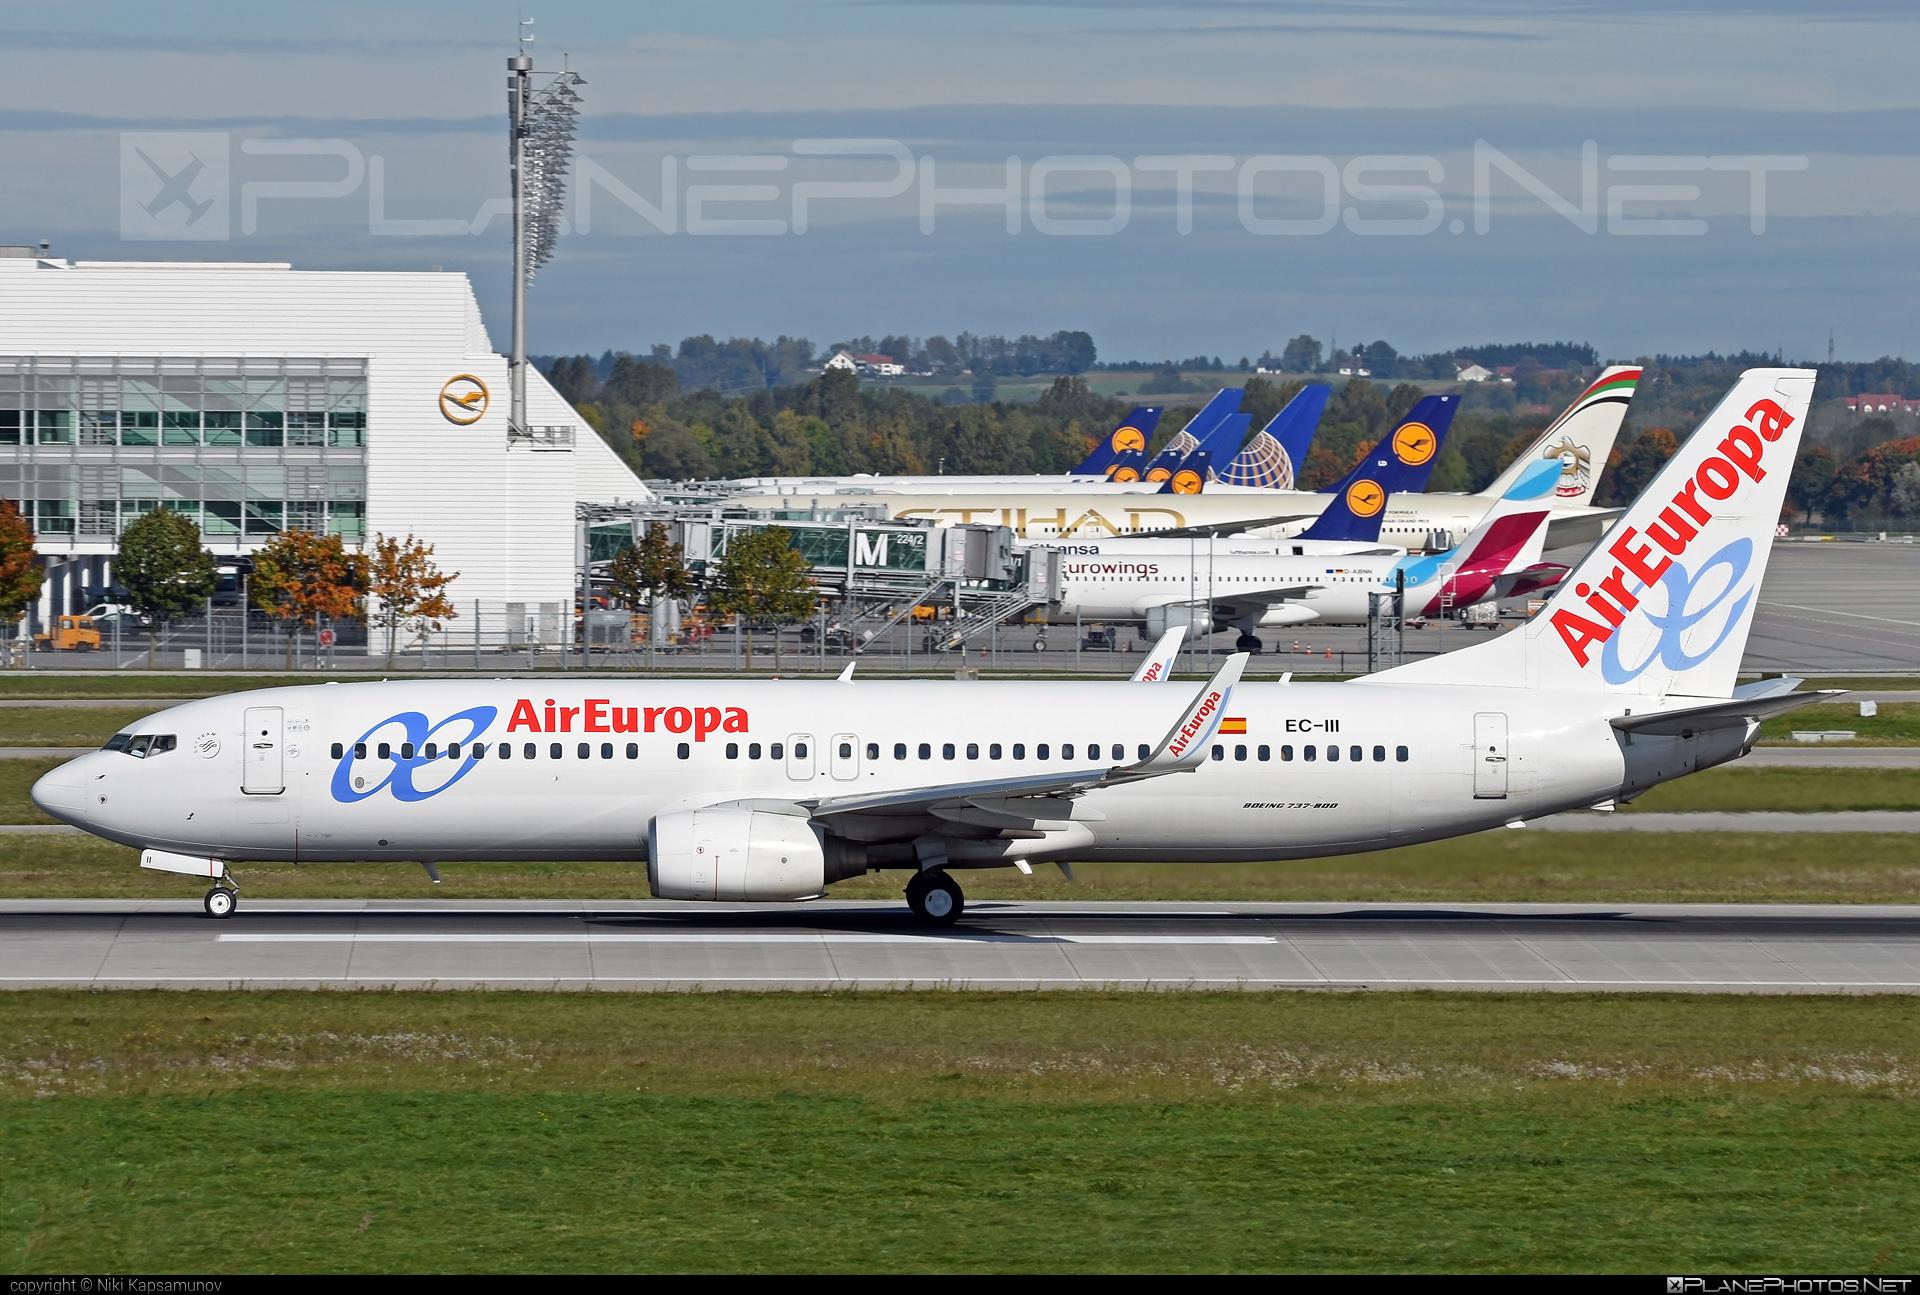 Boeing 737-800 - EC-III operated by Air Europa #b737 #b737nextgen #b737ng #boeing #boeing737